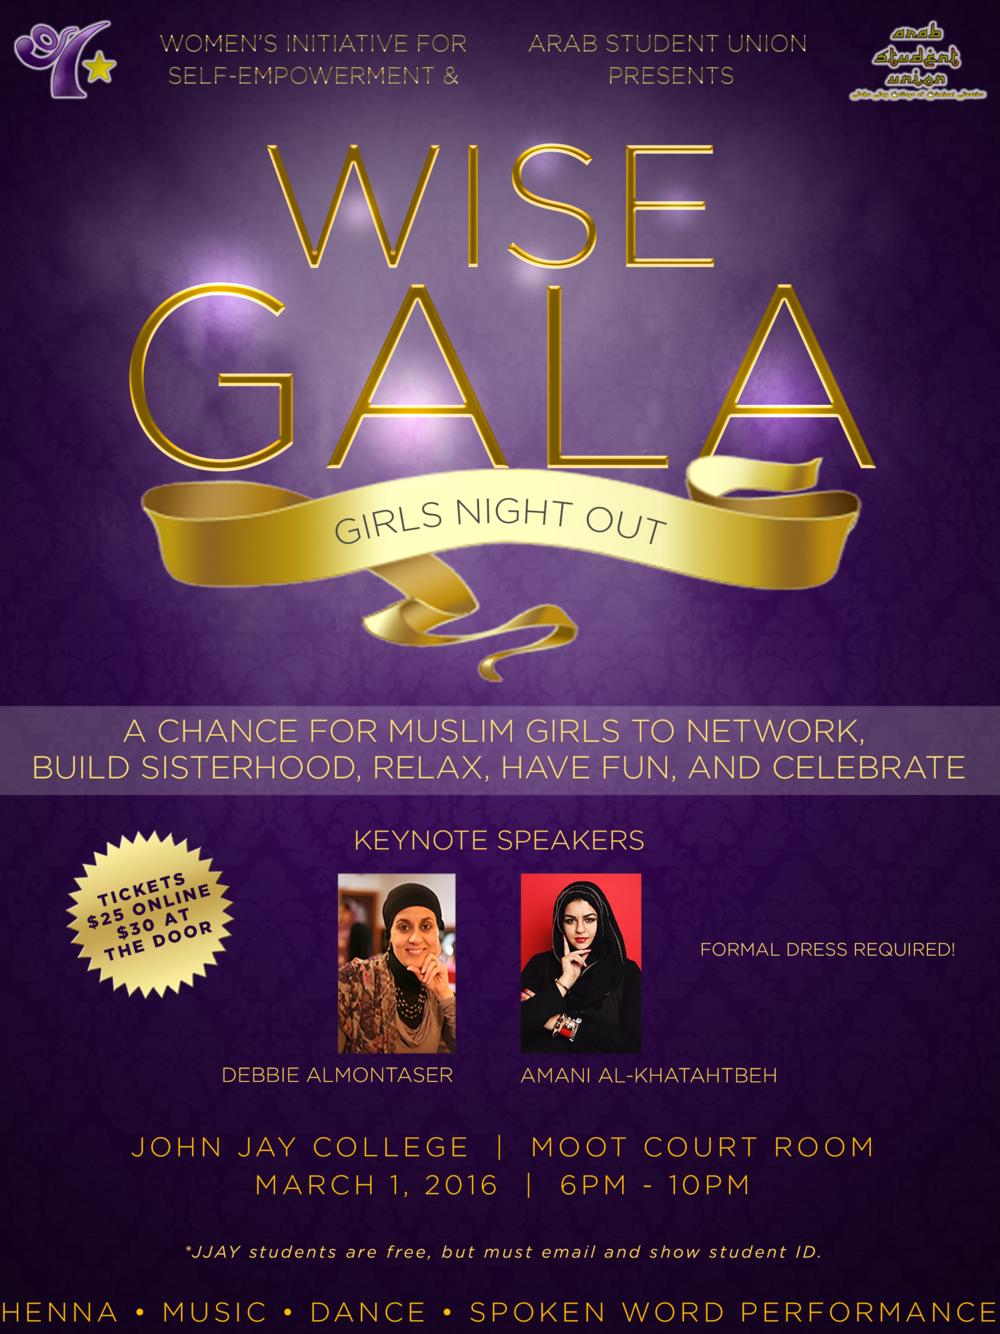 WISE GALA v3.png